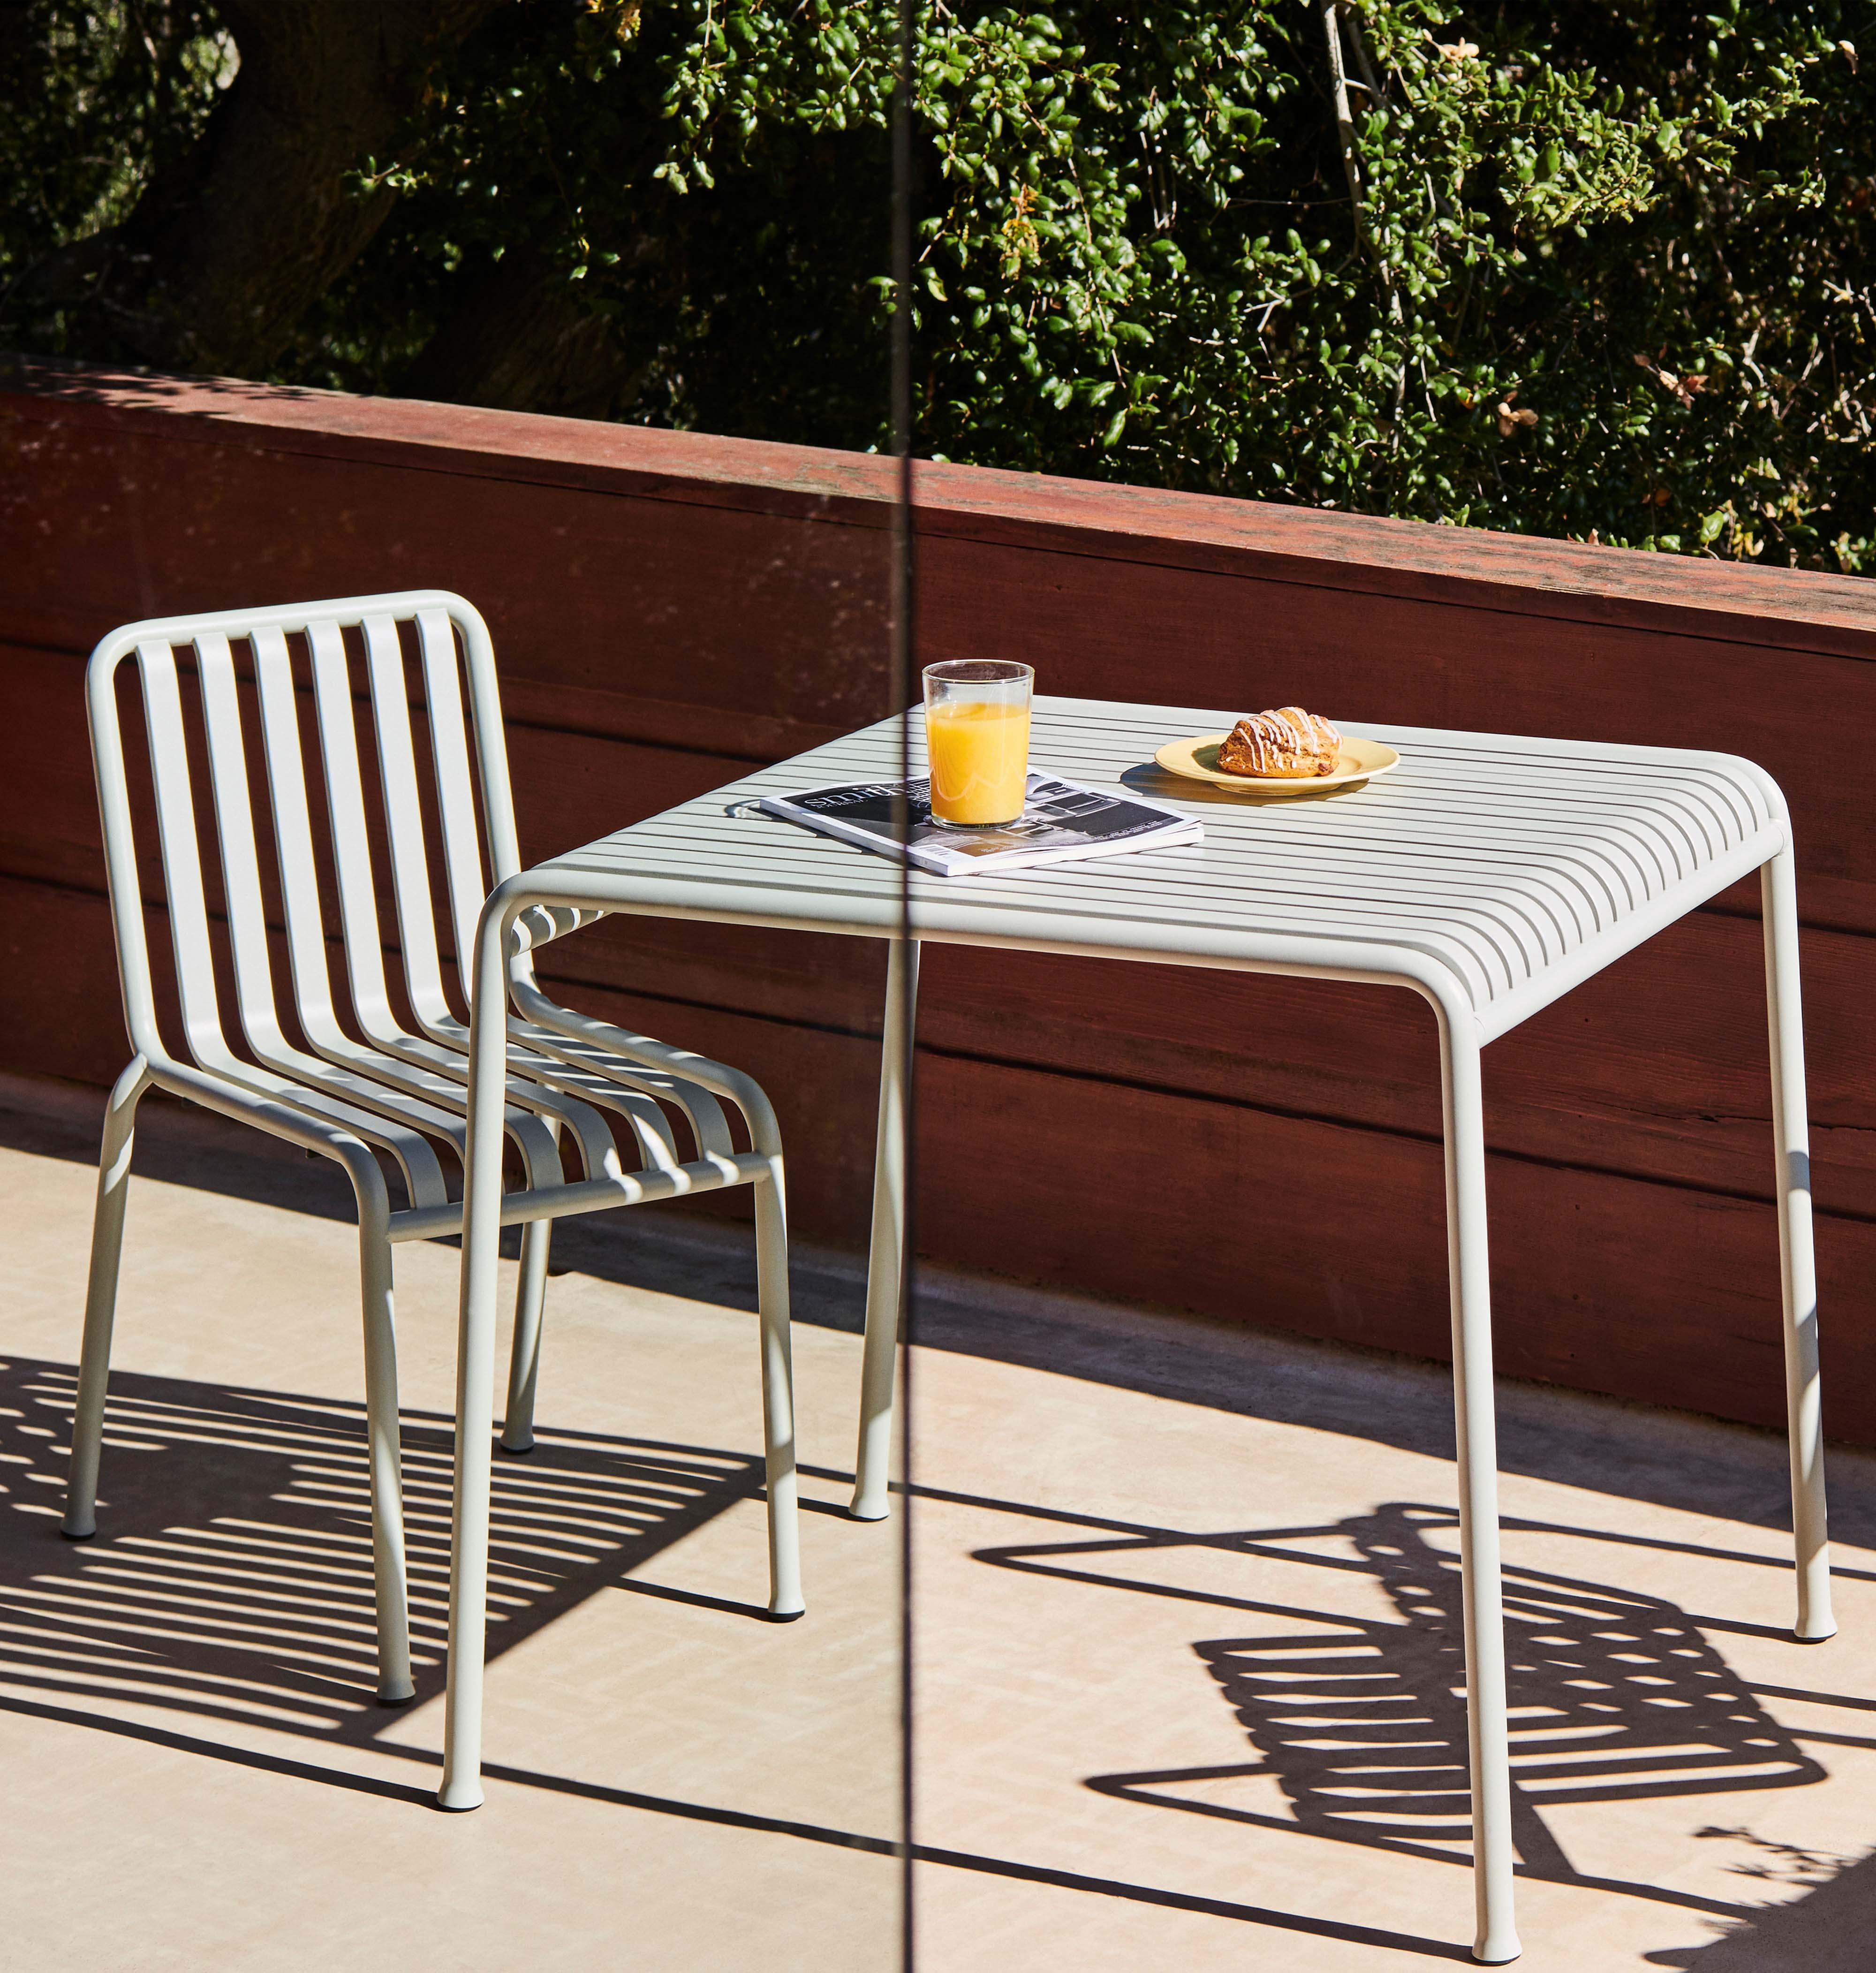 hay-palissade-chair